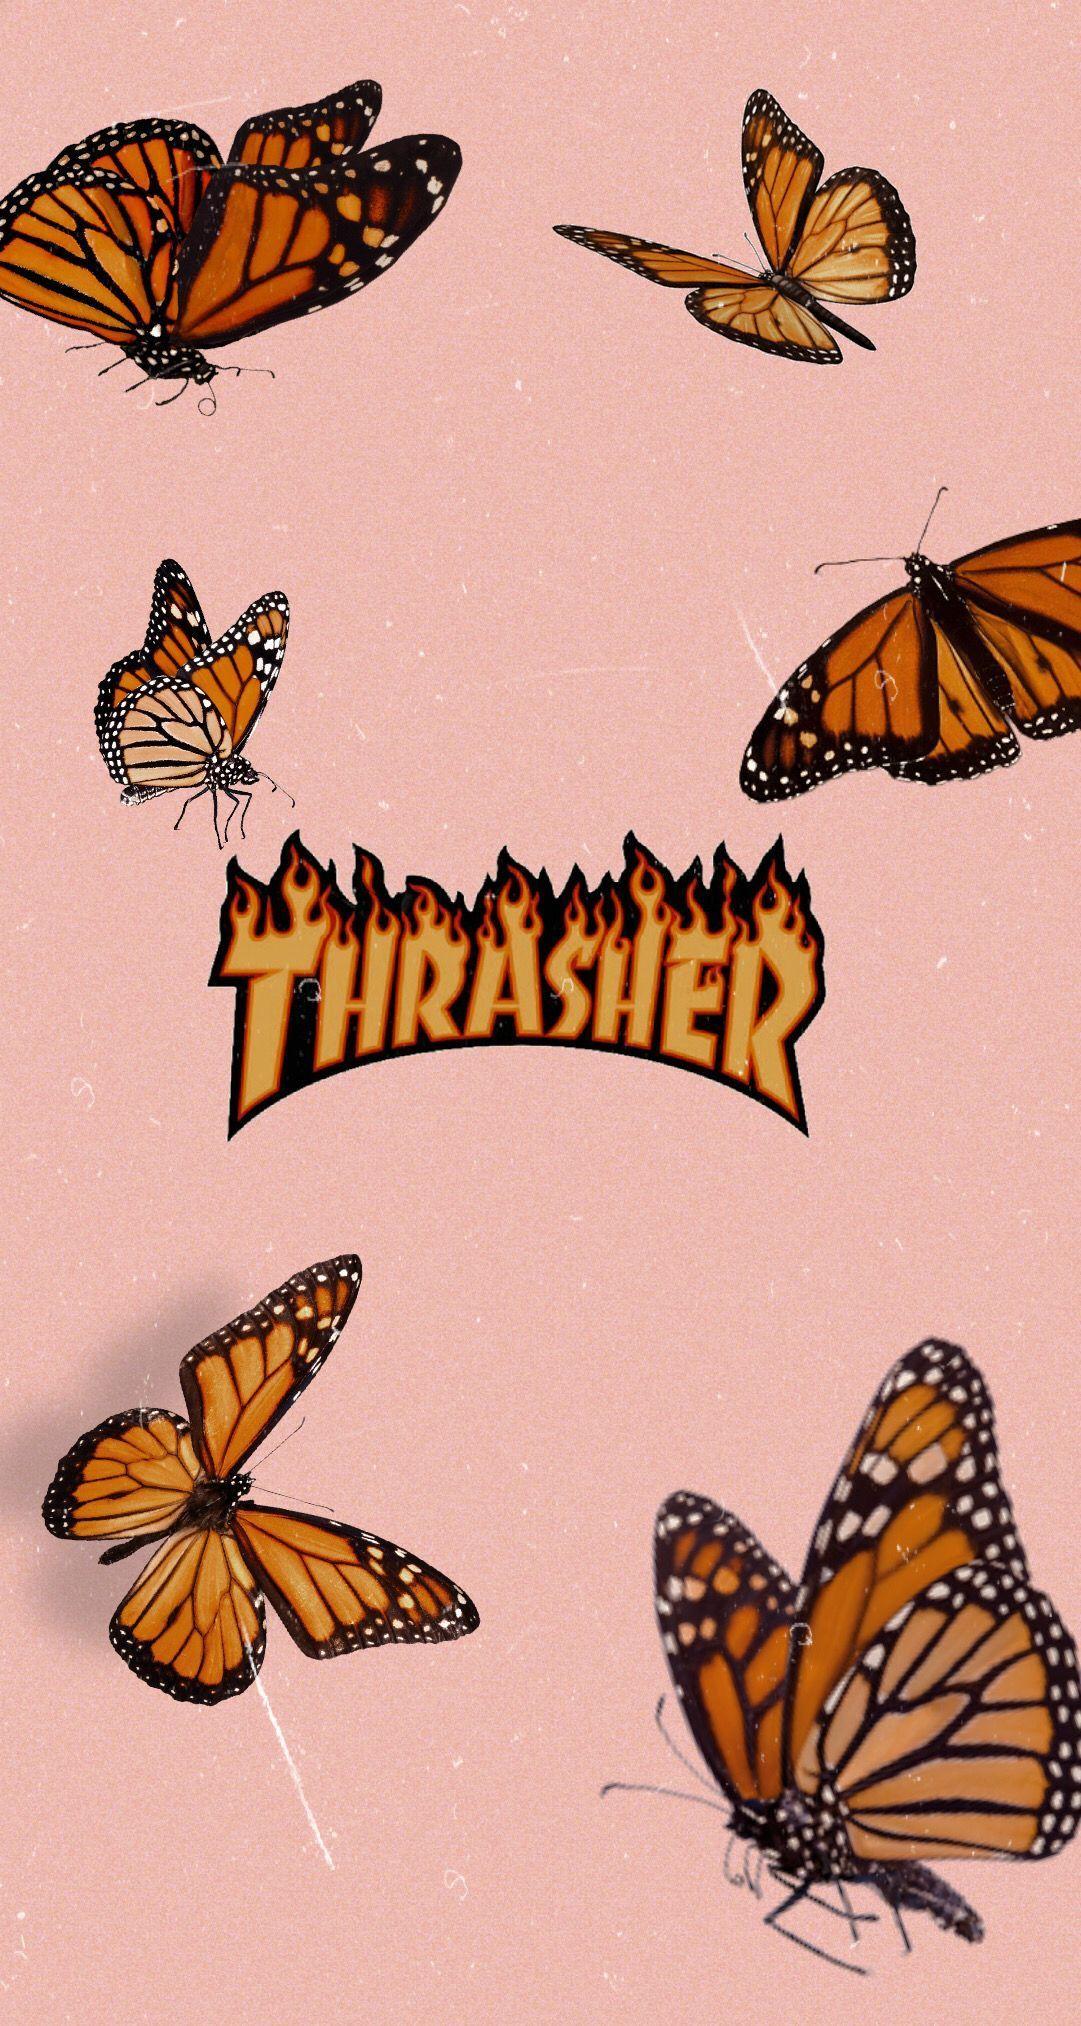 thrasher wallpaper for iphone